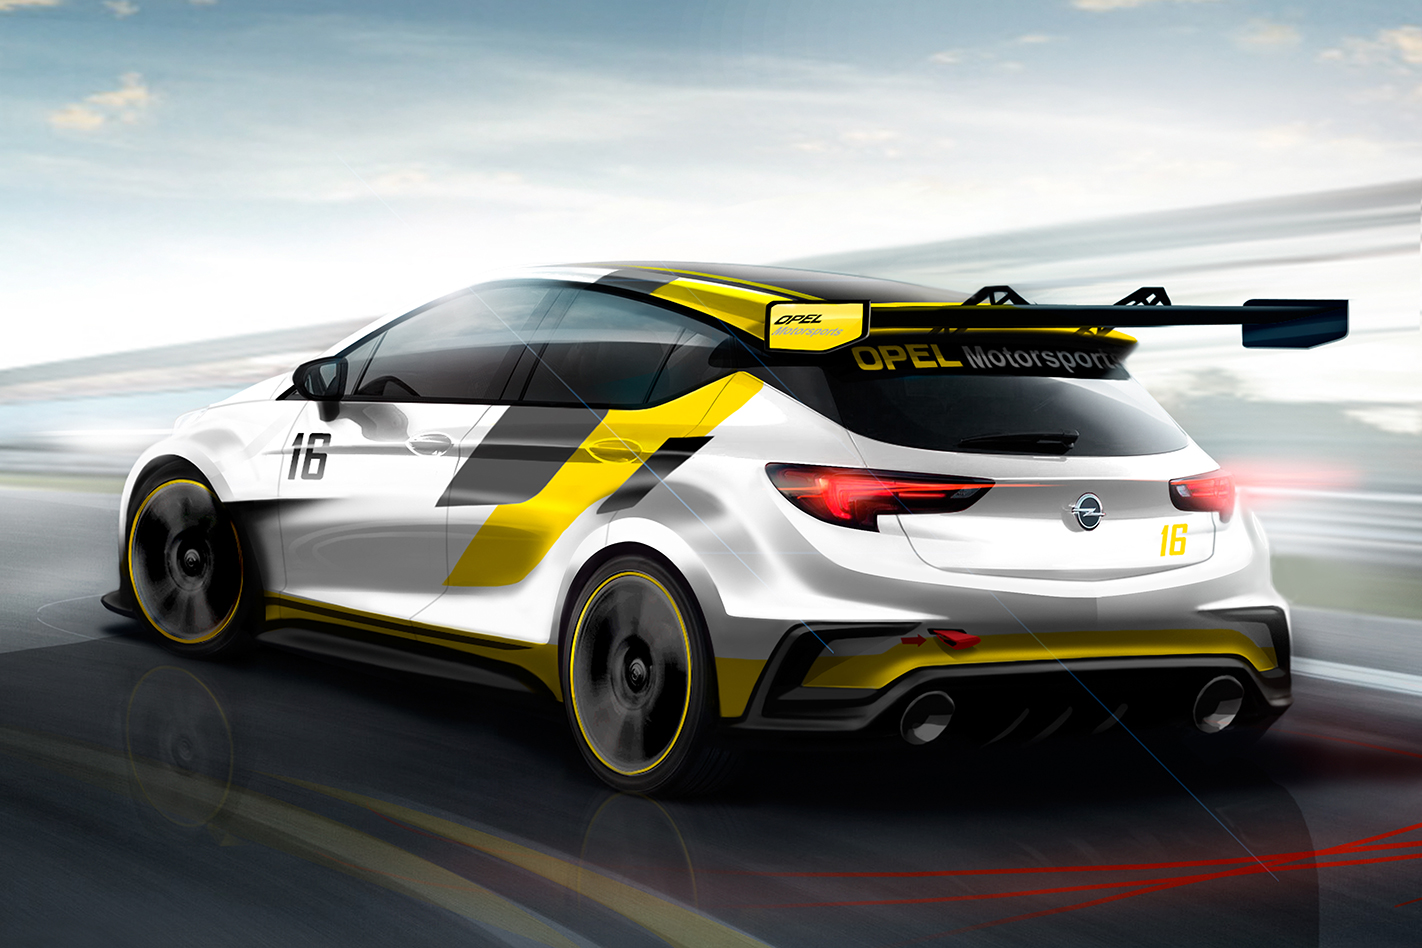 2015 Opel Astra widebody